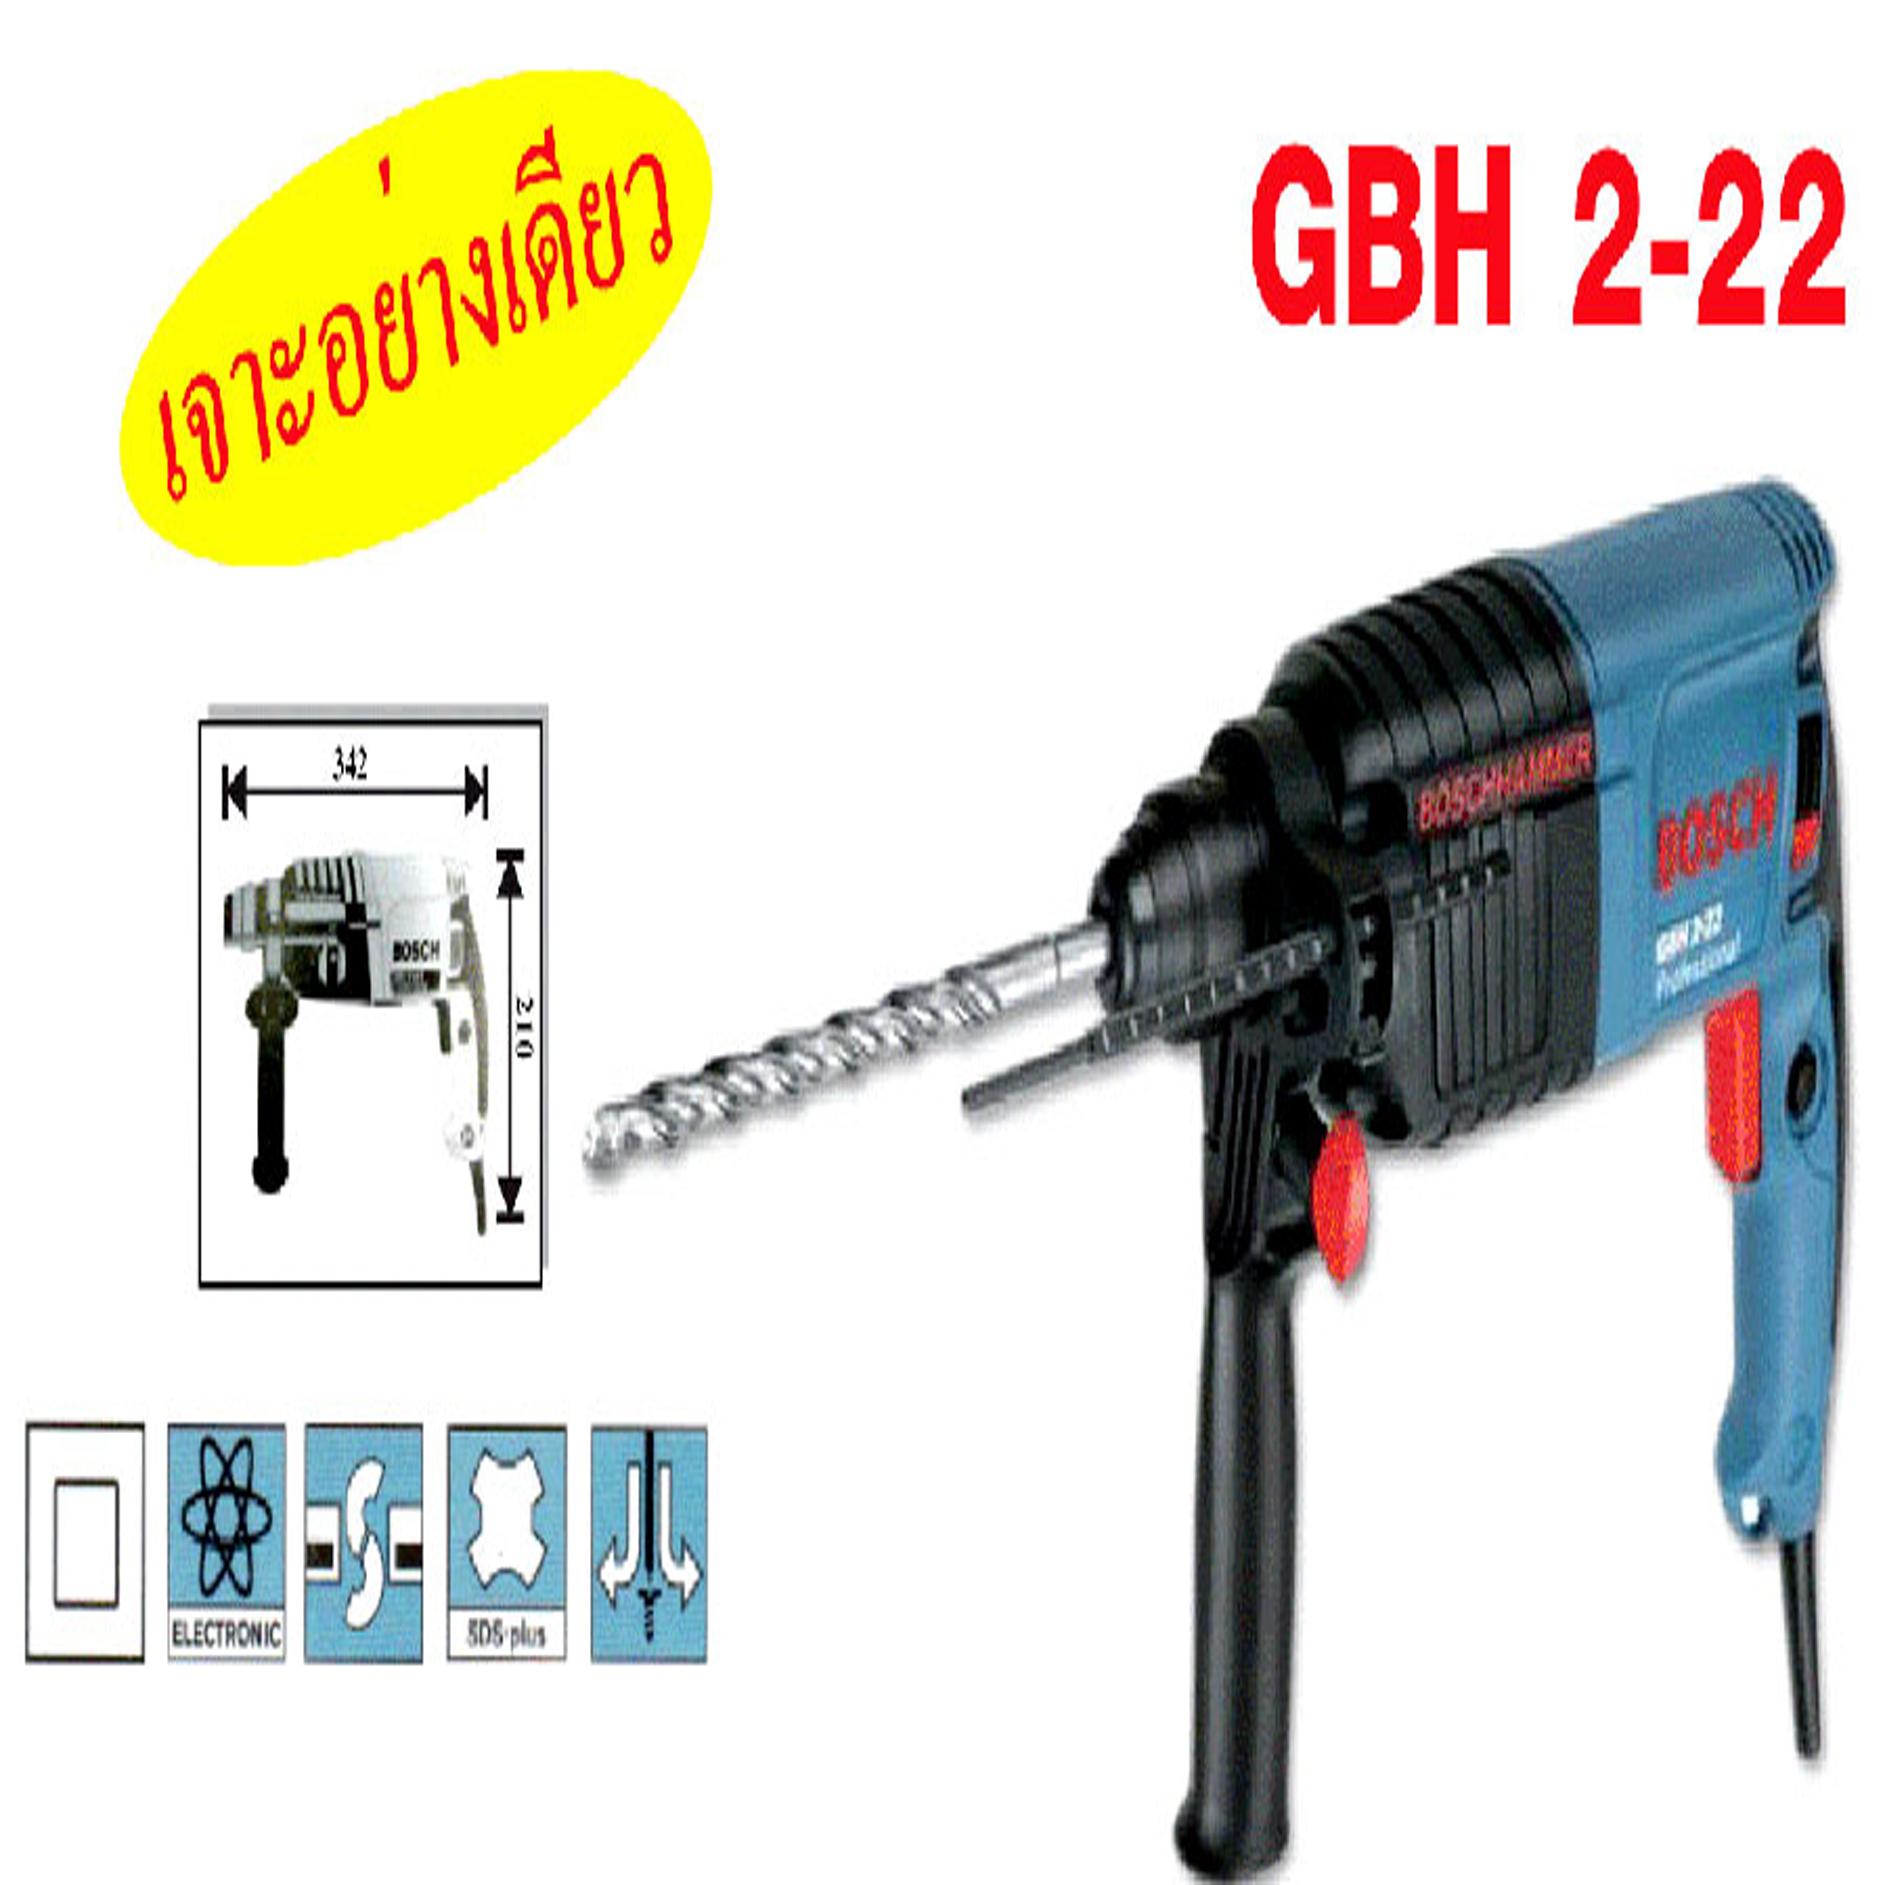 Jual Mesin Bor Rotary Hammer Drill Makita Hr 2470 3 Harga Bosch Gbh 2 18 Re 22 Tembok